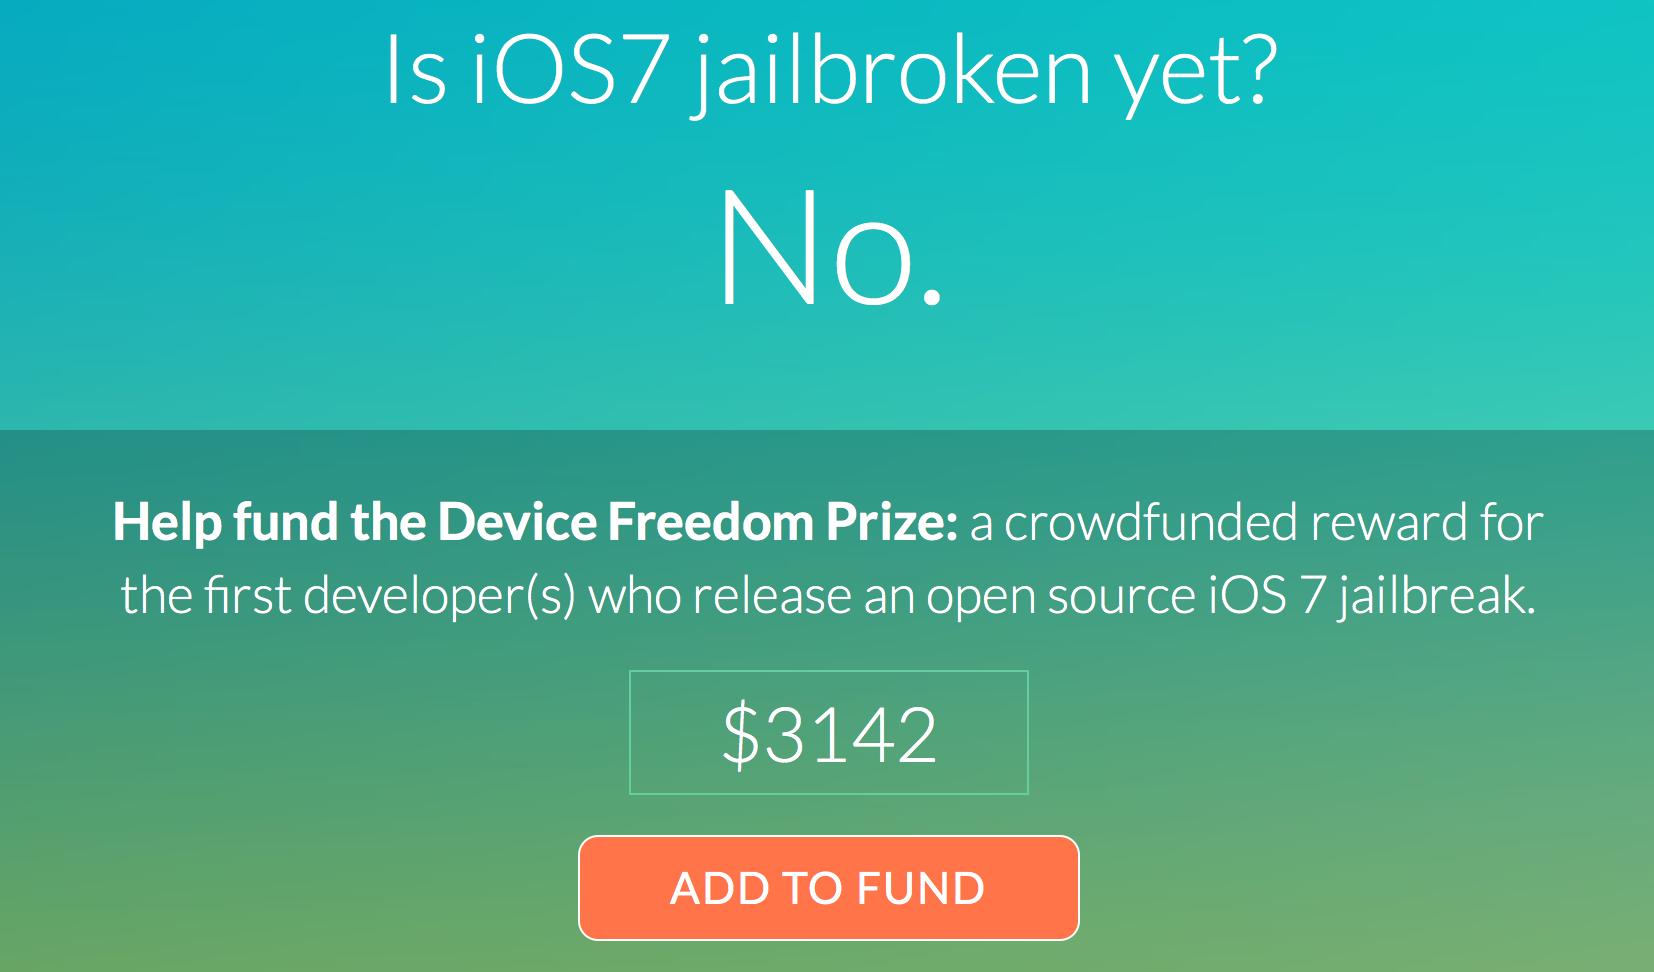 New Campaign Seeks Help To Fund An iOS 7 Jailbreak Reward